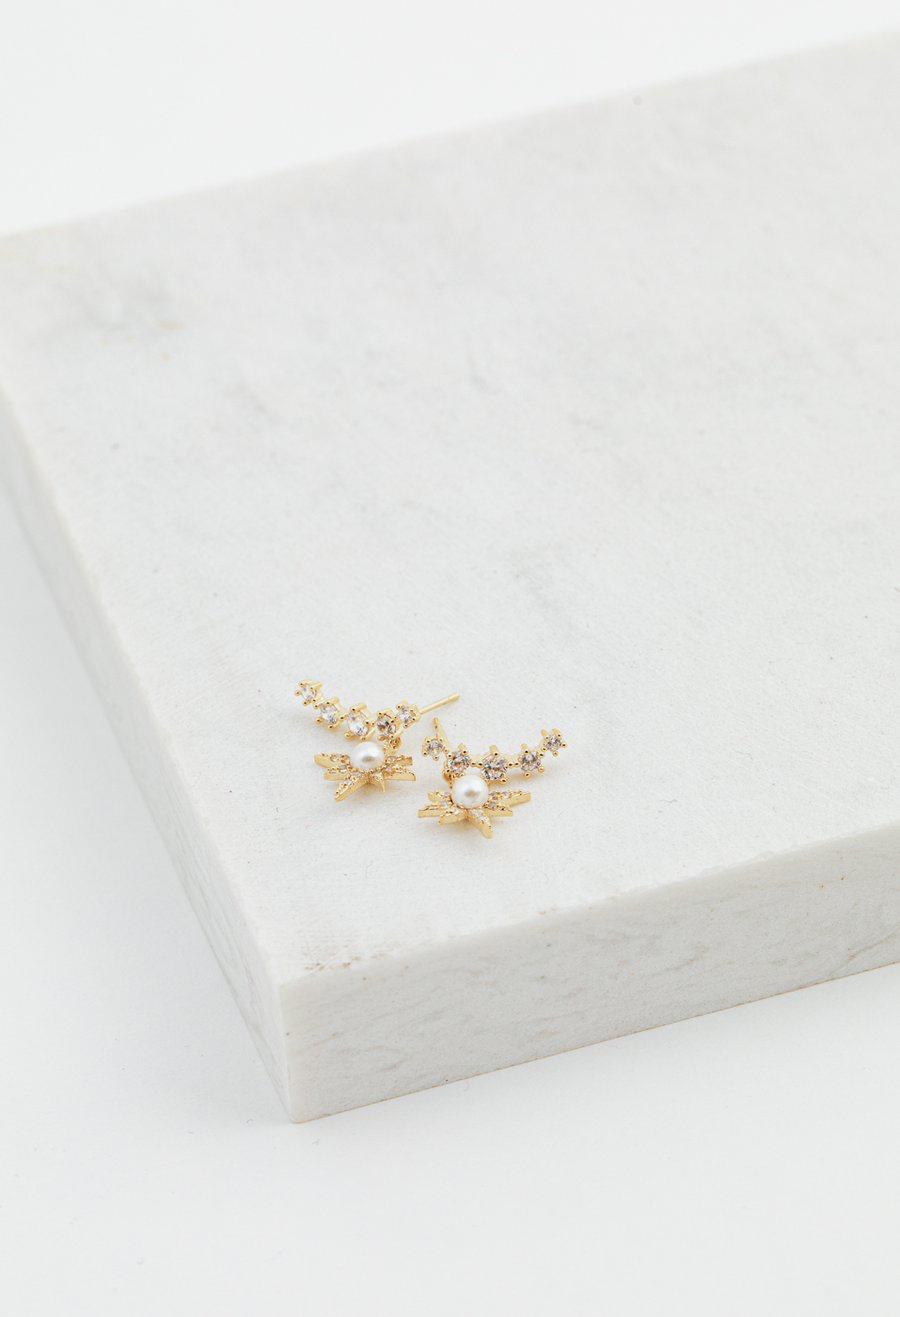 Alaia Climber Earrings - Gold